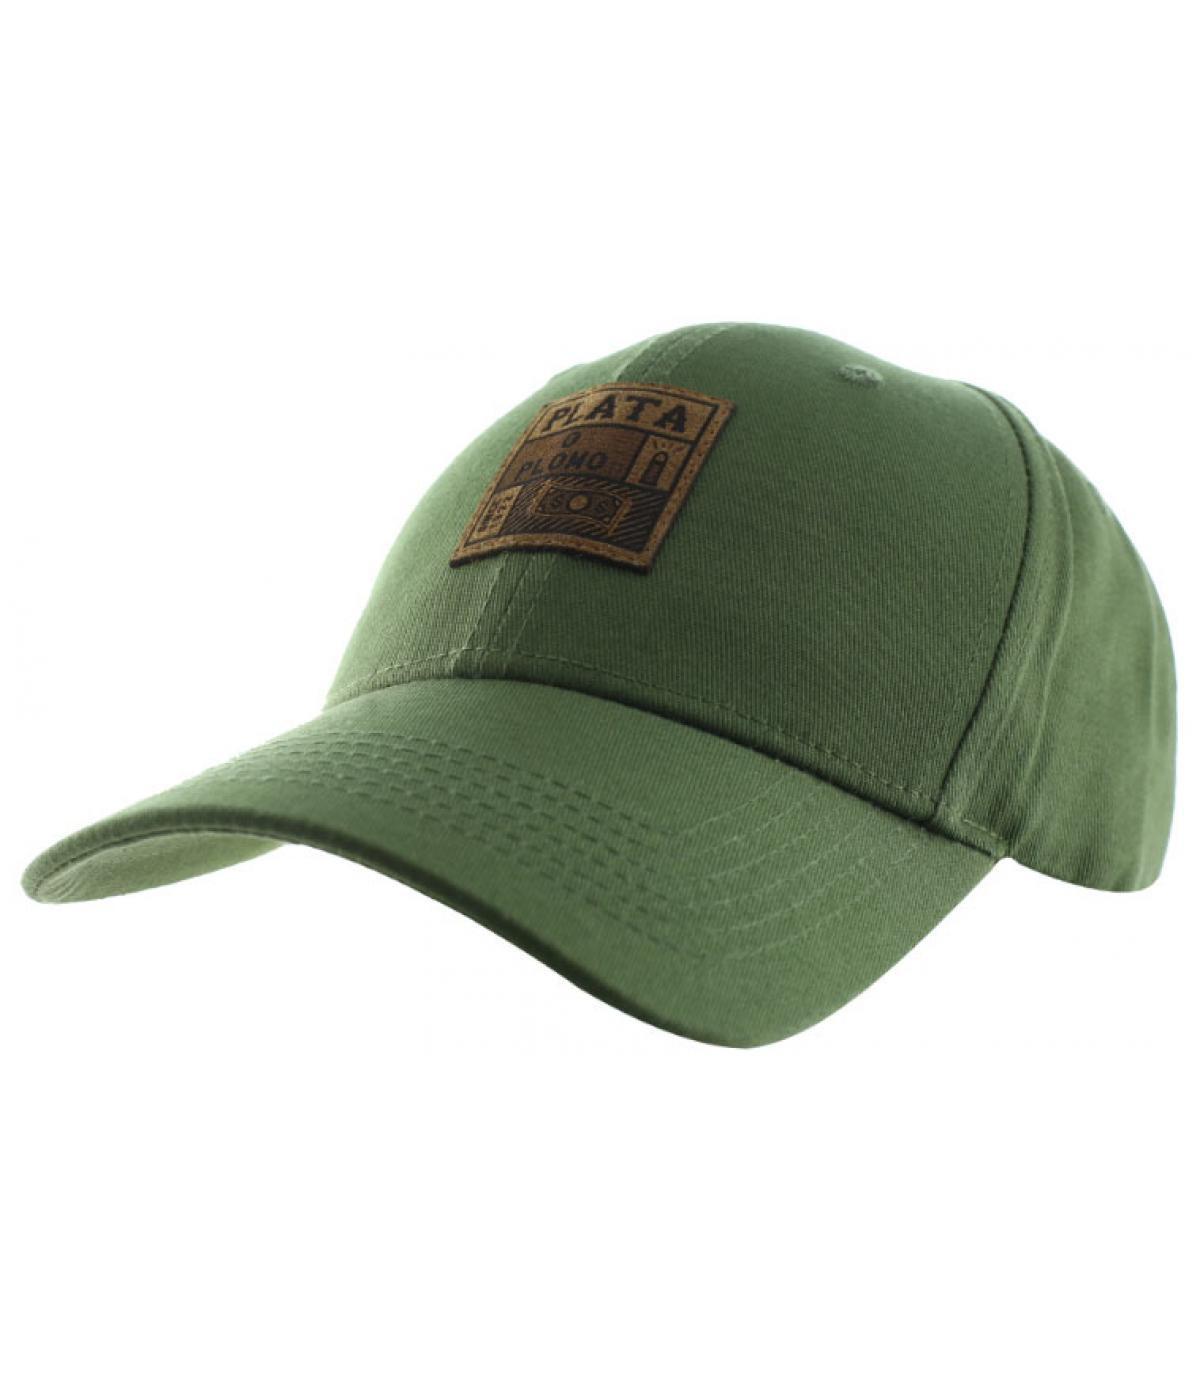 casquette plata o plomo vert